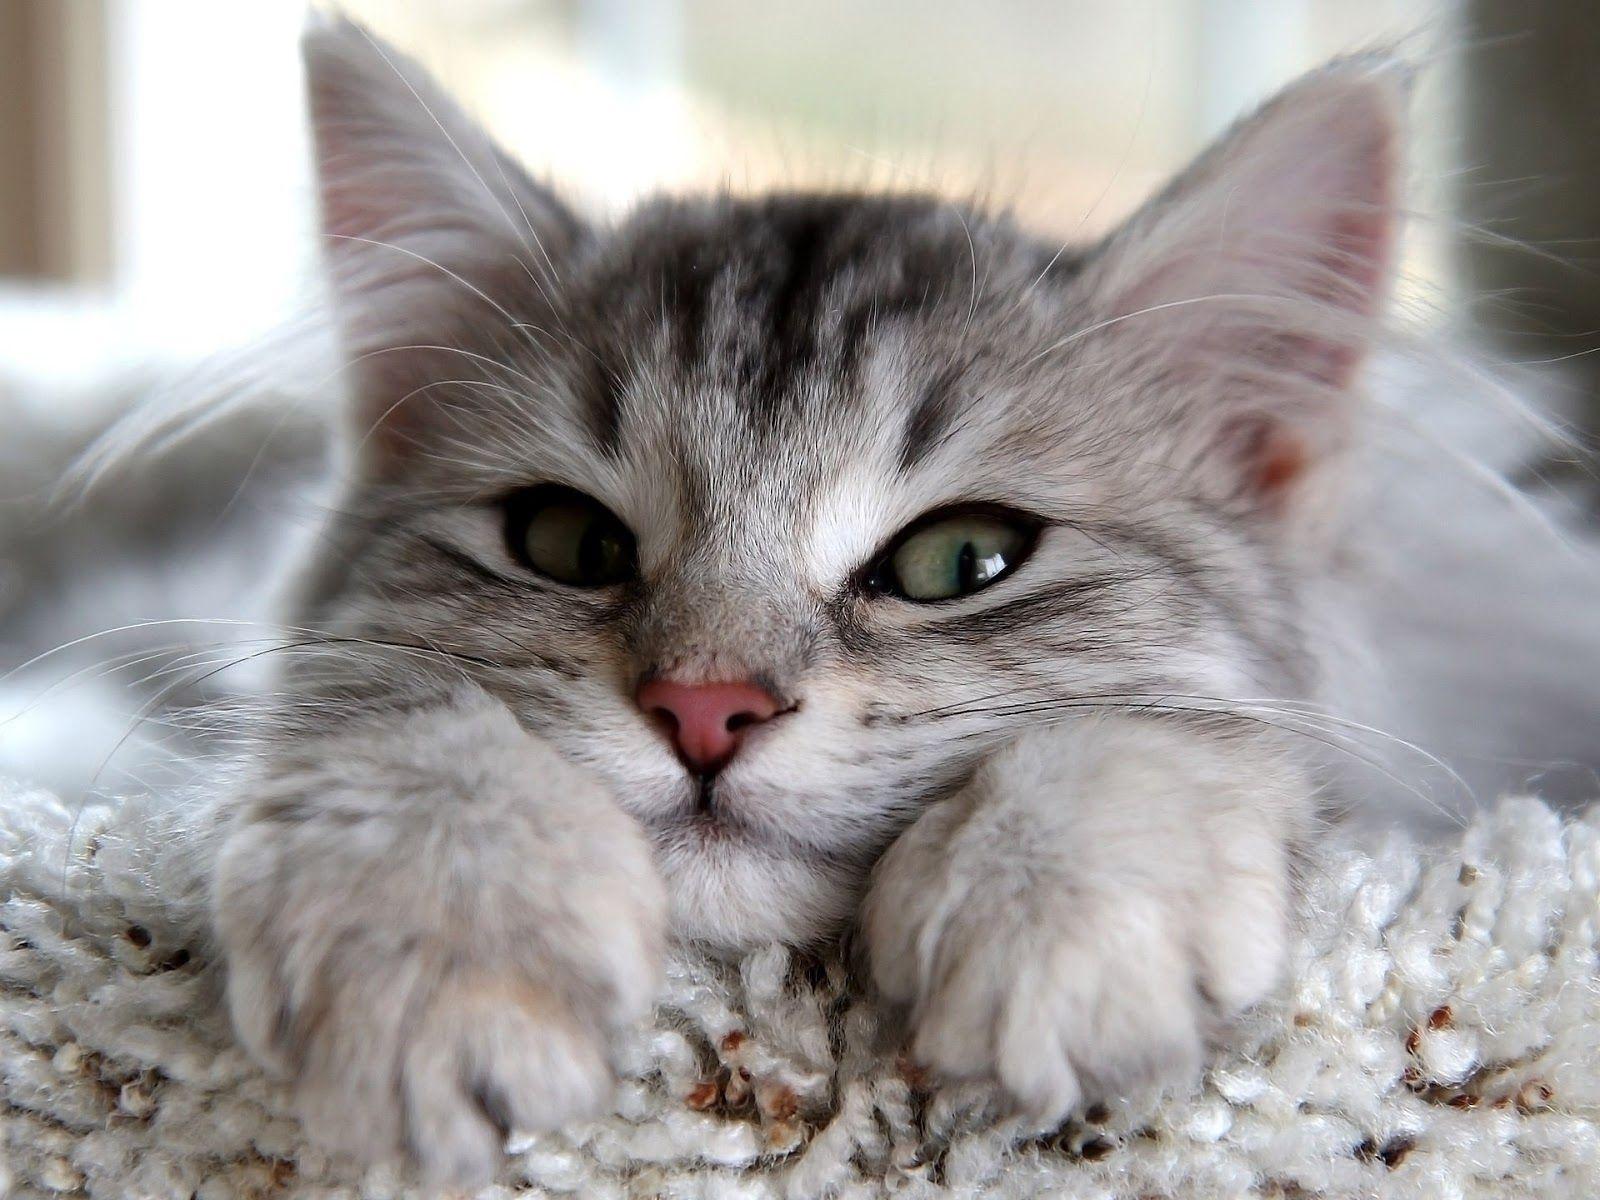 Beautiful And Amazing Animals And Birds Wallpapers خلفيات طيور وحيوانات في قمة الروعة Pretty Cats Cats Cute Animals